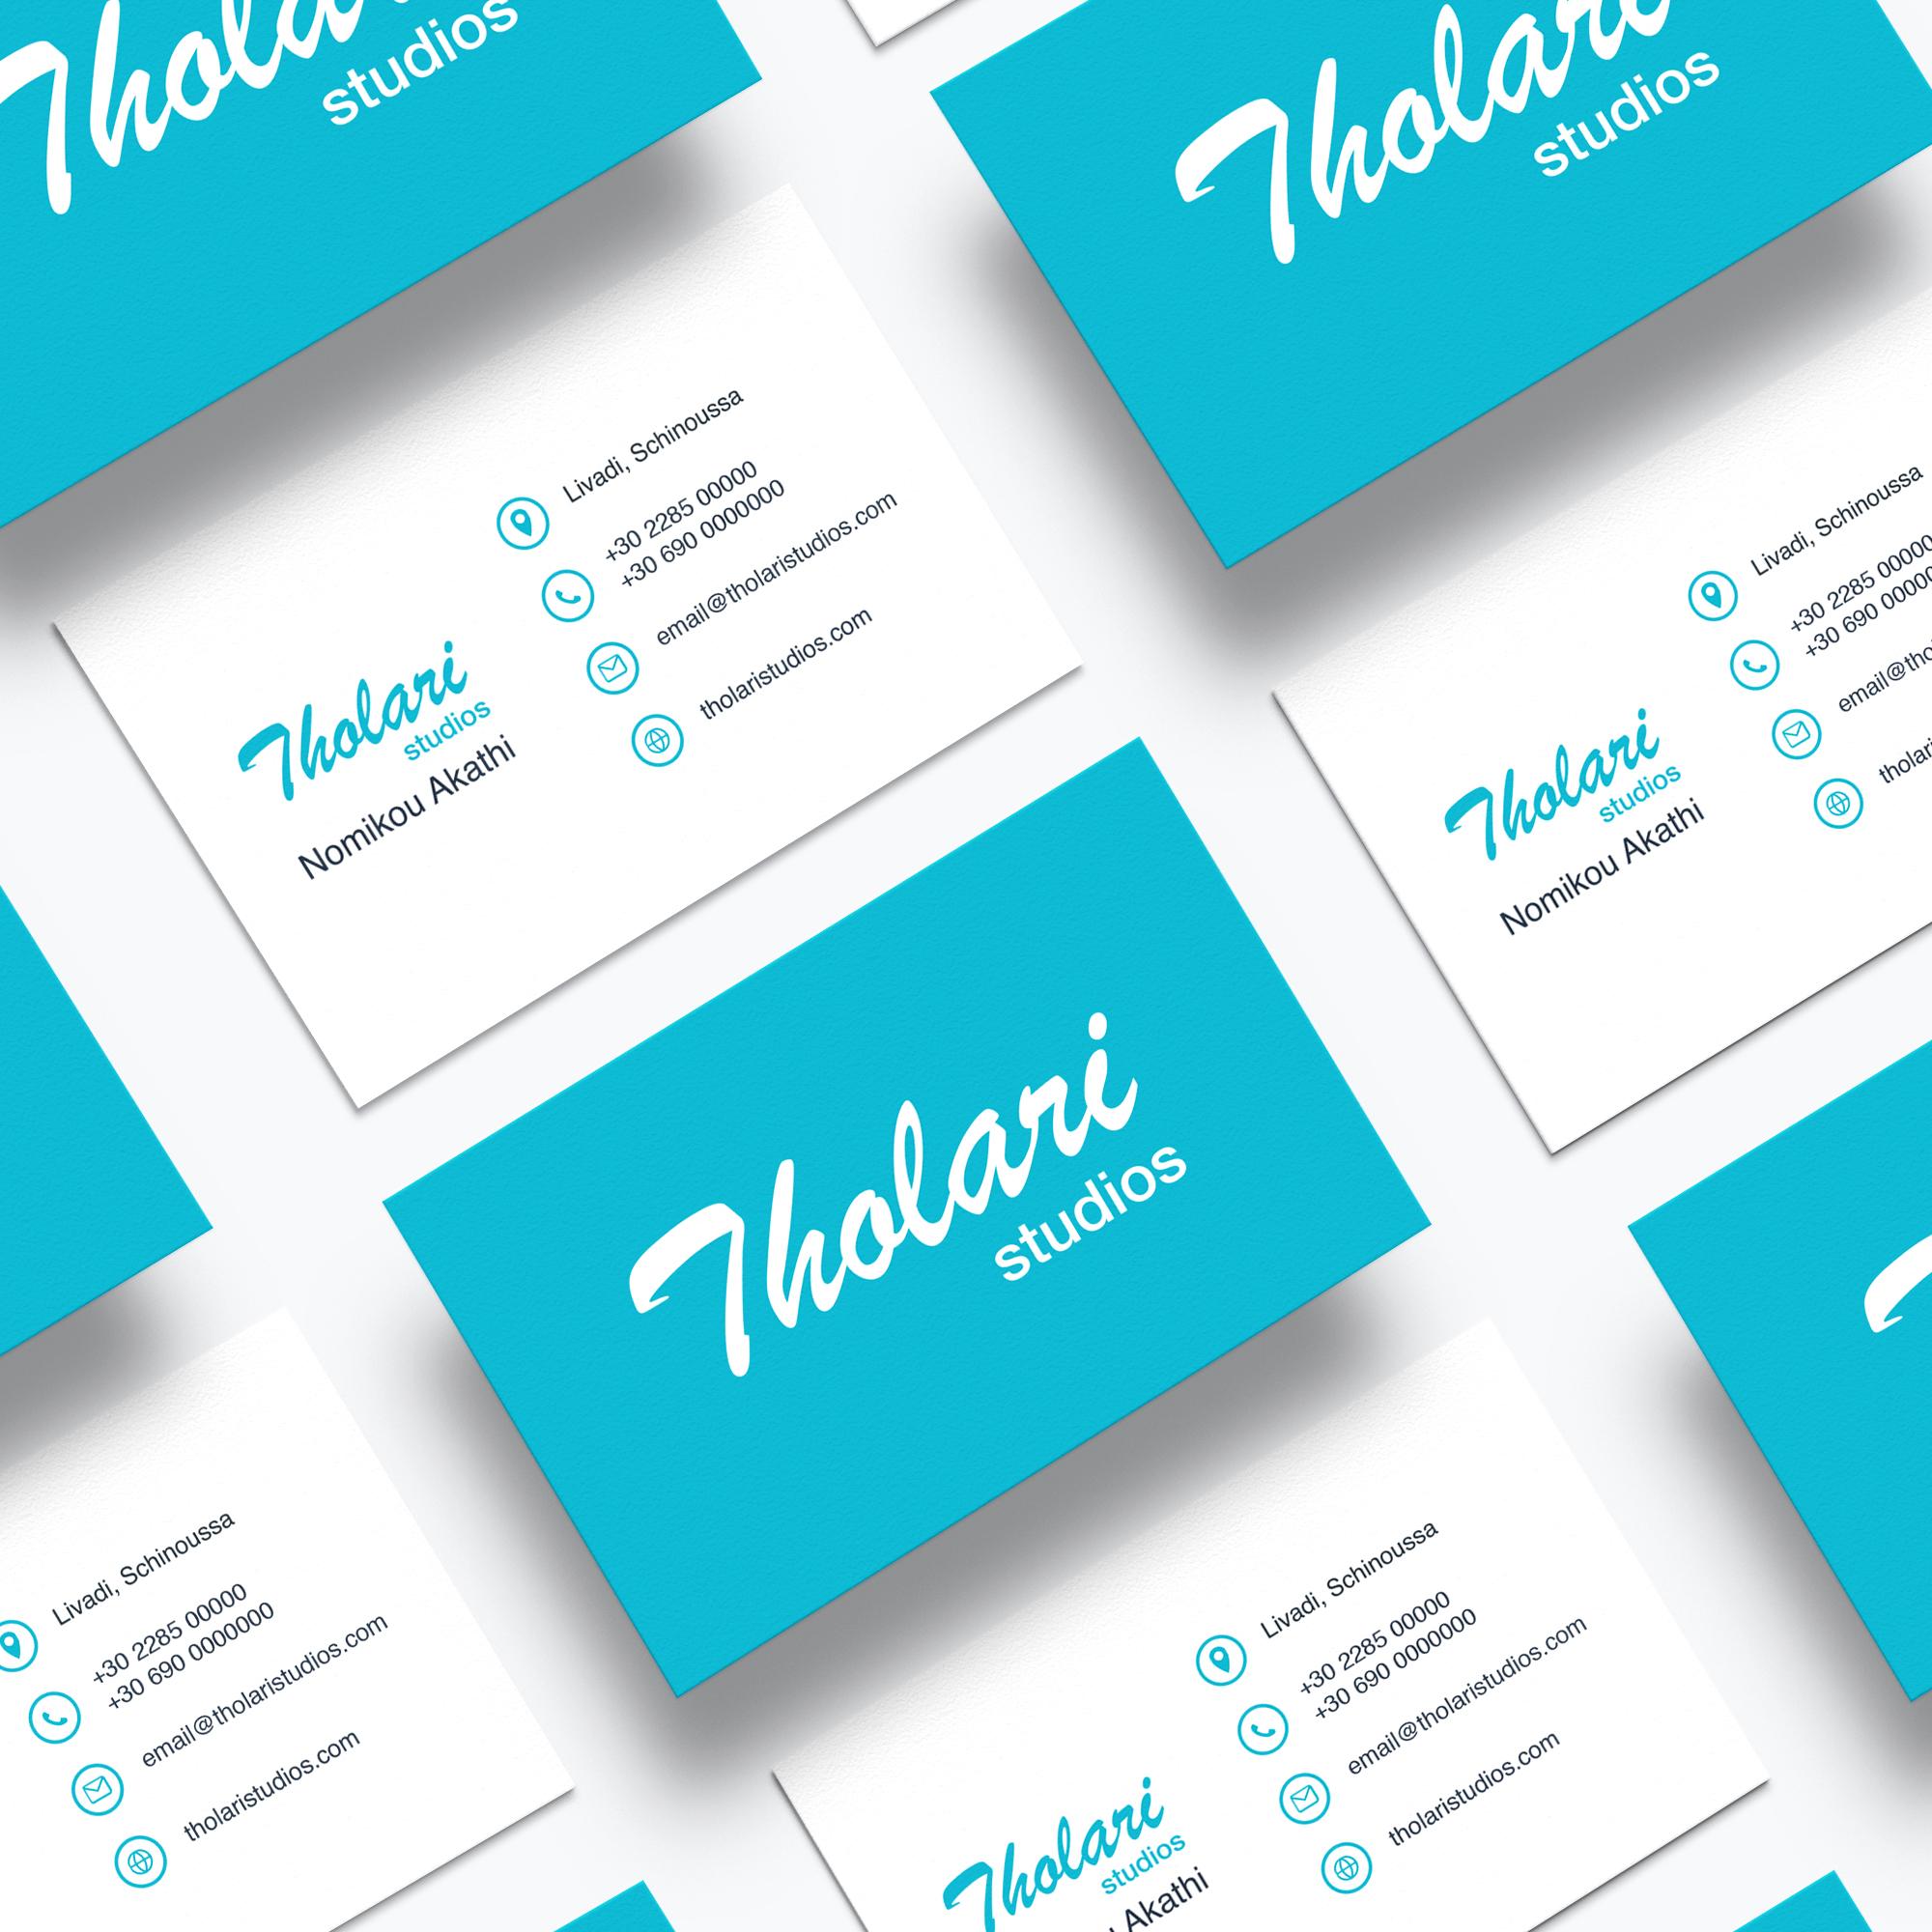 Tholari Studios' business card design, both sides